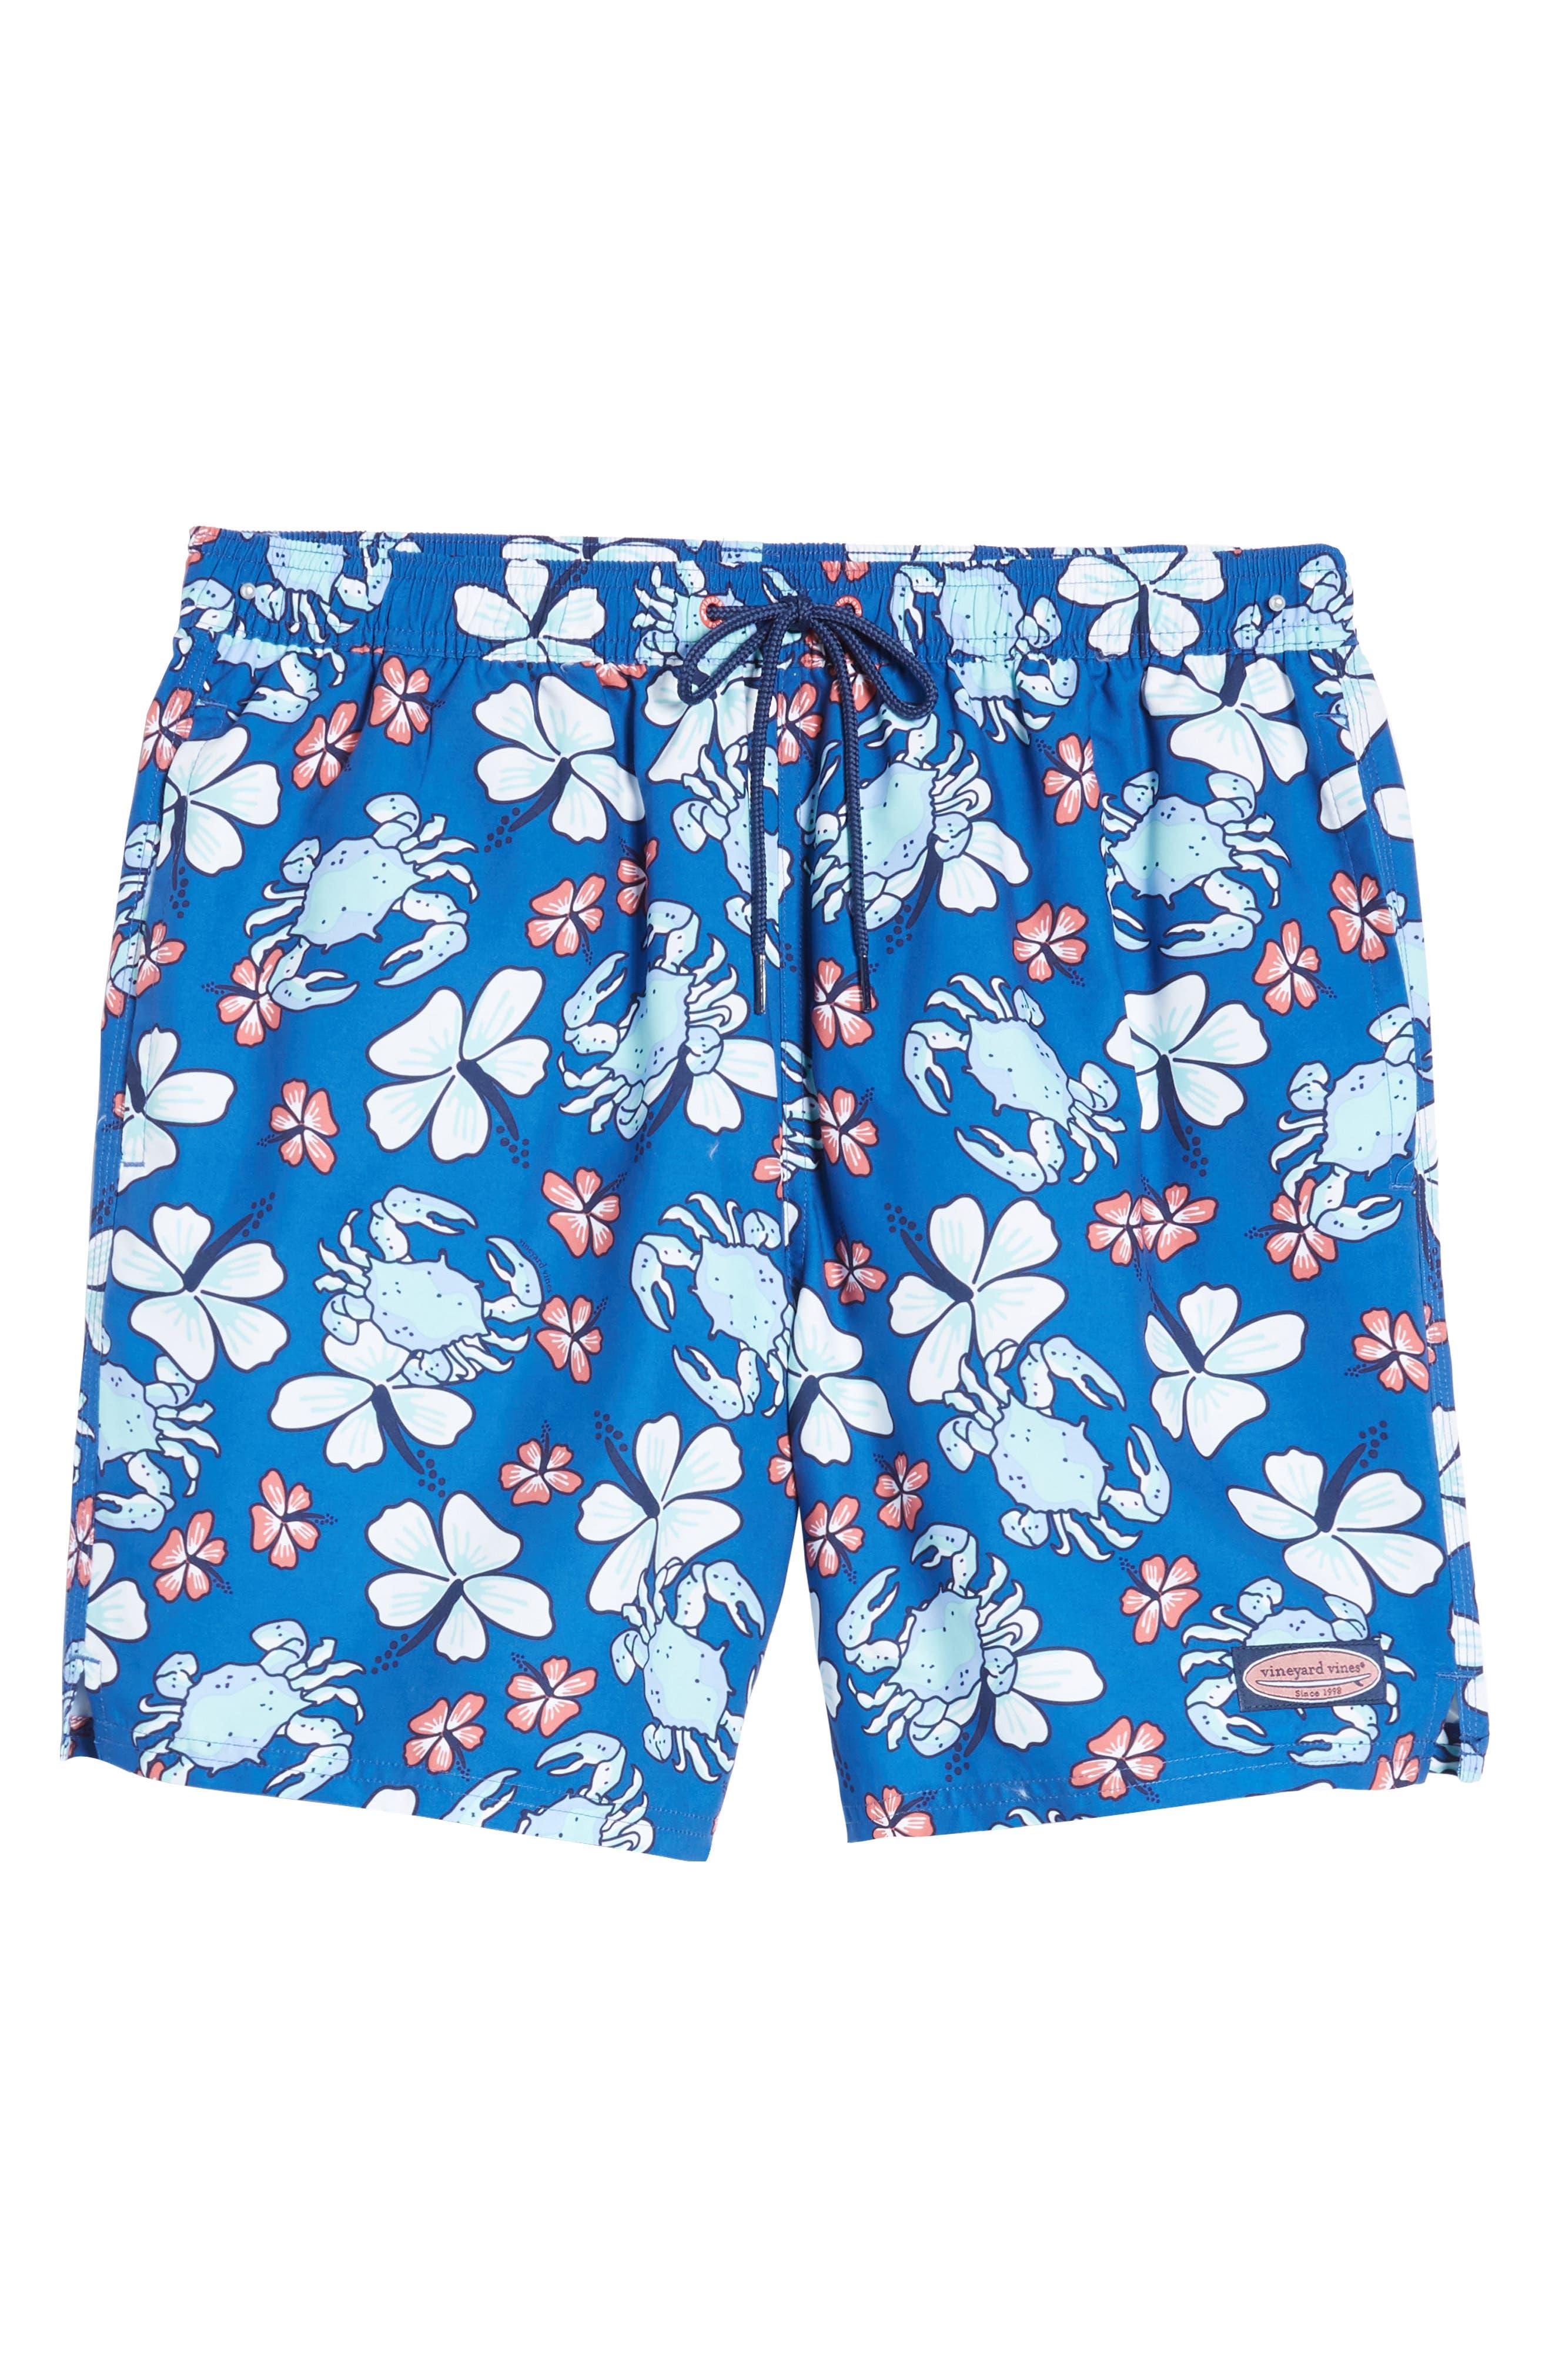 Chappy Crab Floral Swim Trunks,                             Alternate thumbnail 6, color,                             Yacht Blue